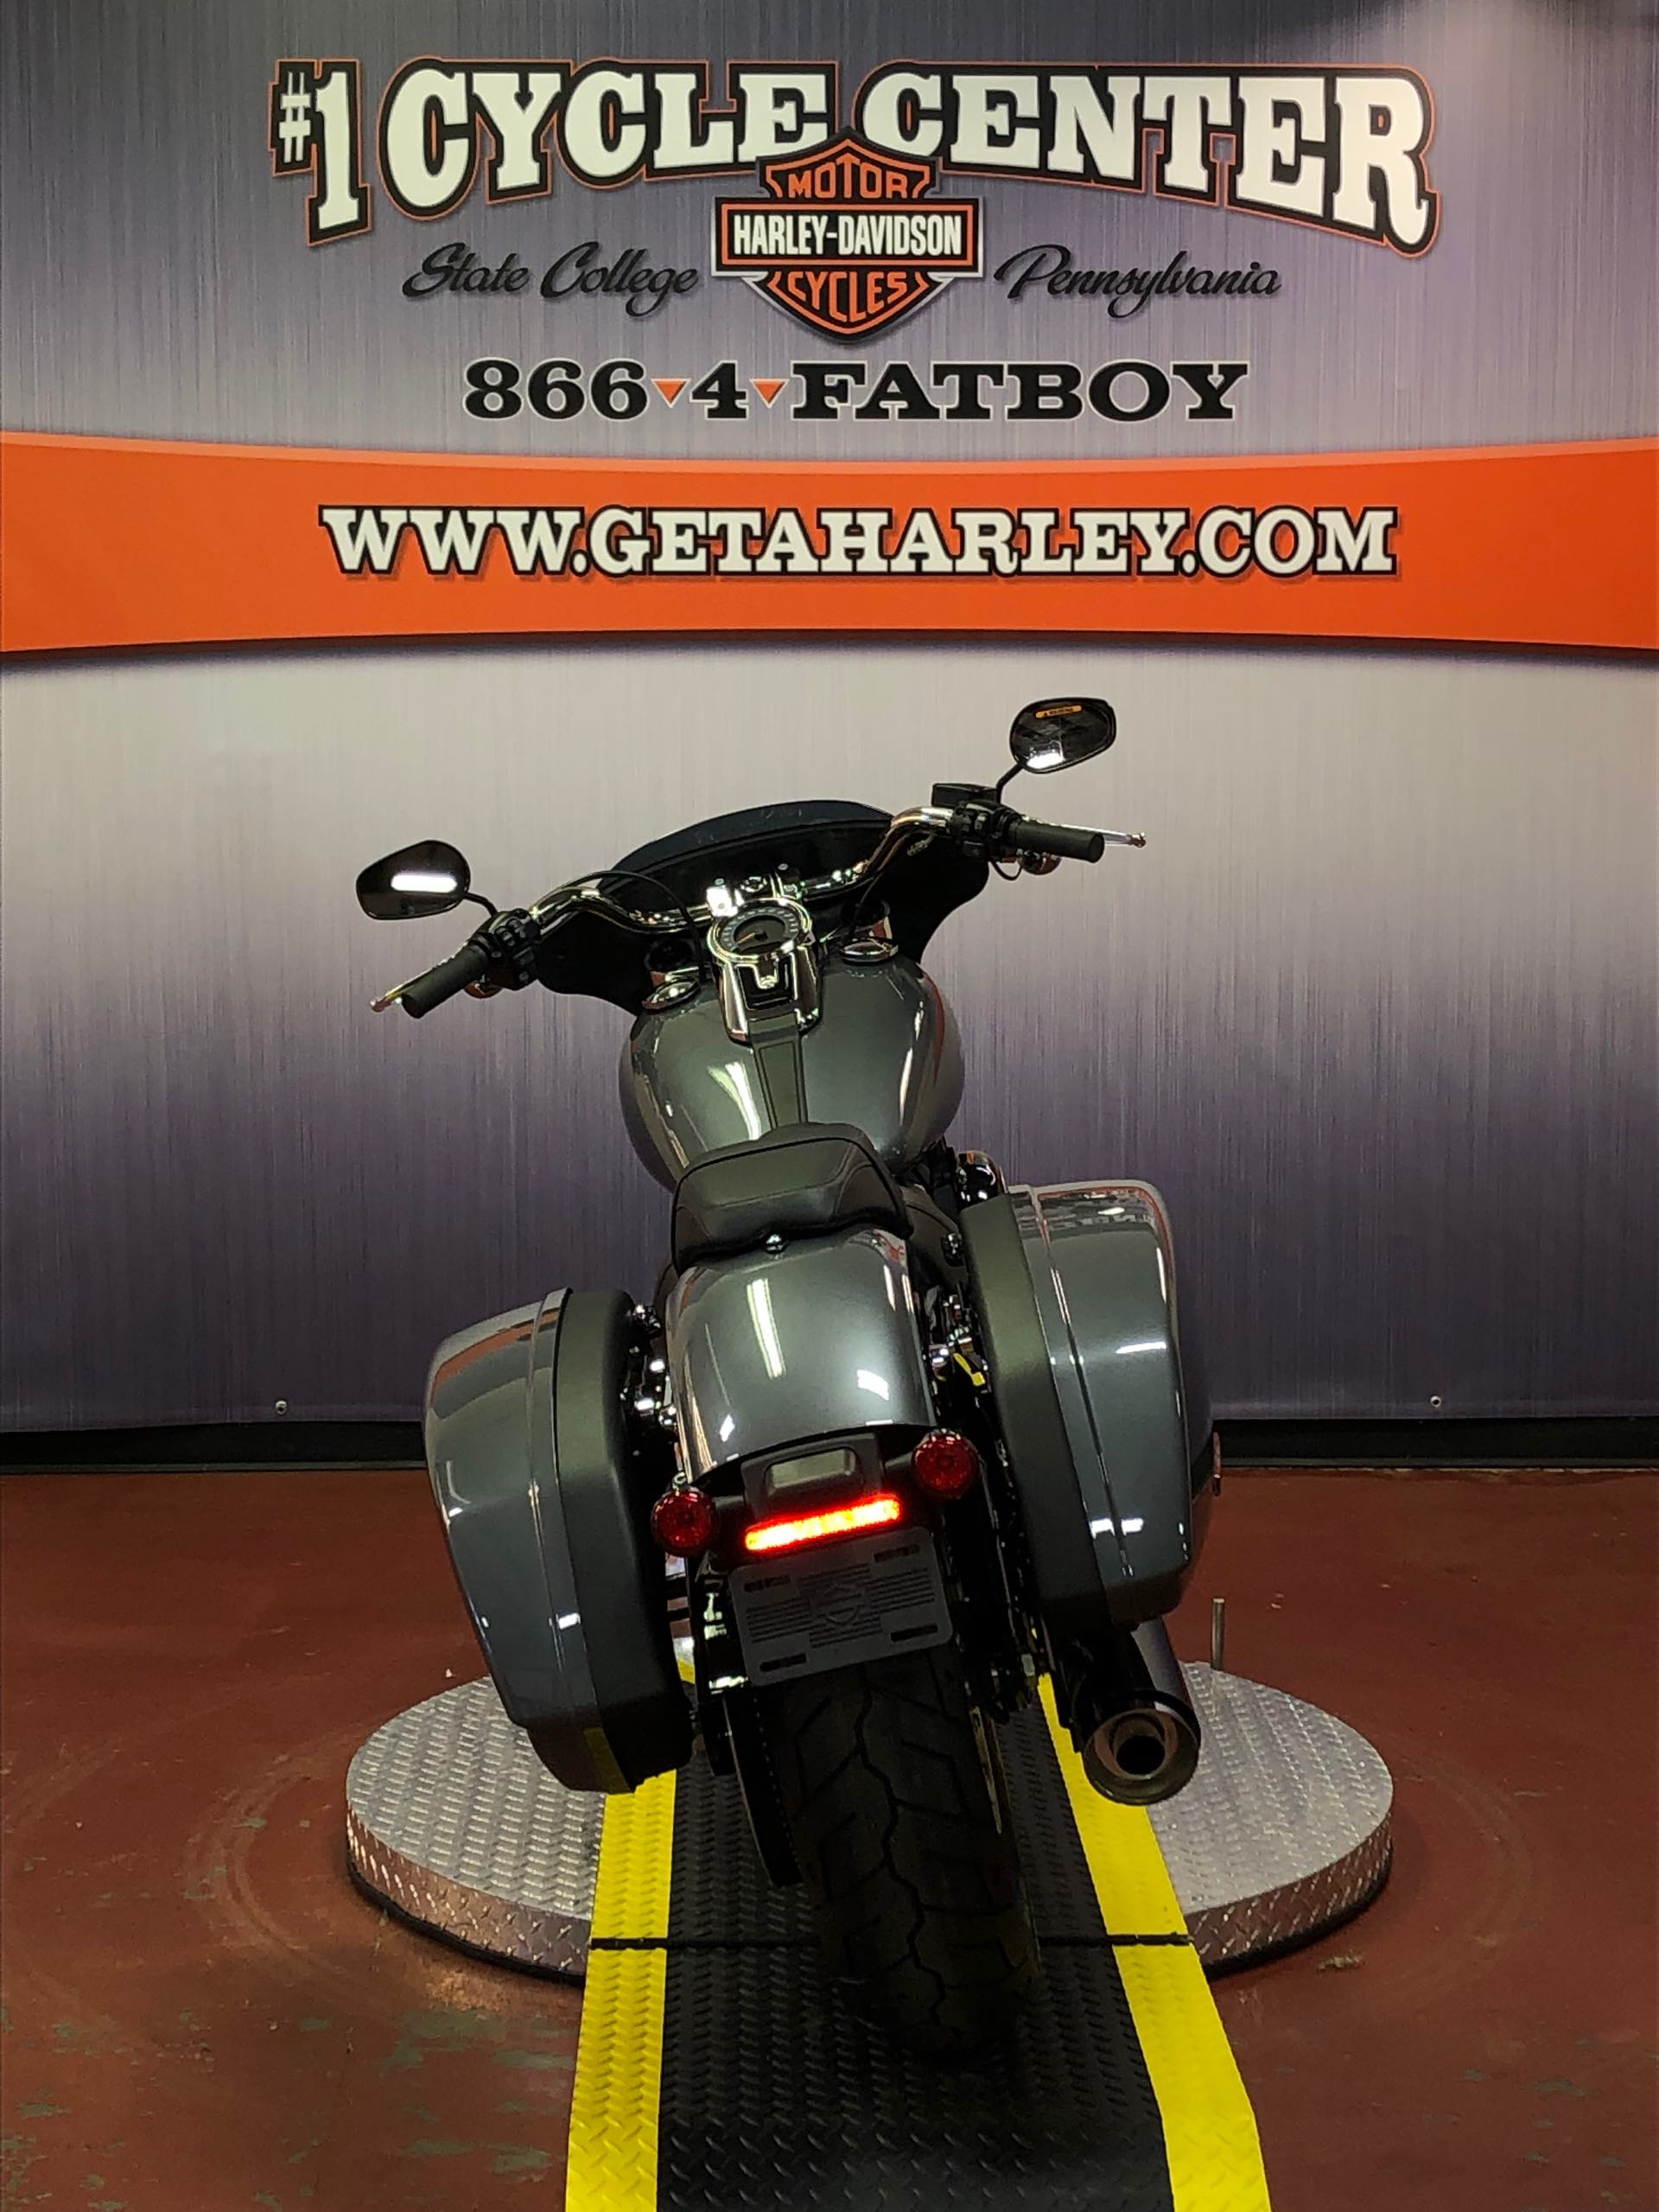 2021 Harley-Davidson FLSB at #1 Cycle Center Harley-Davidson